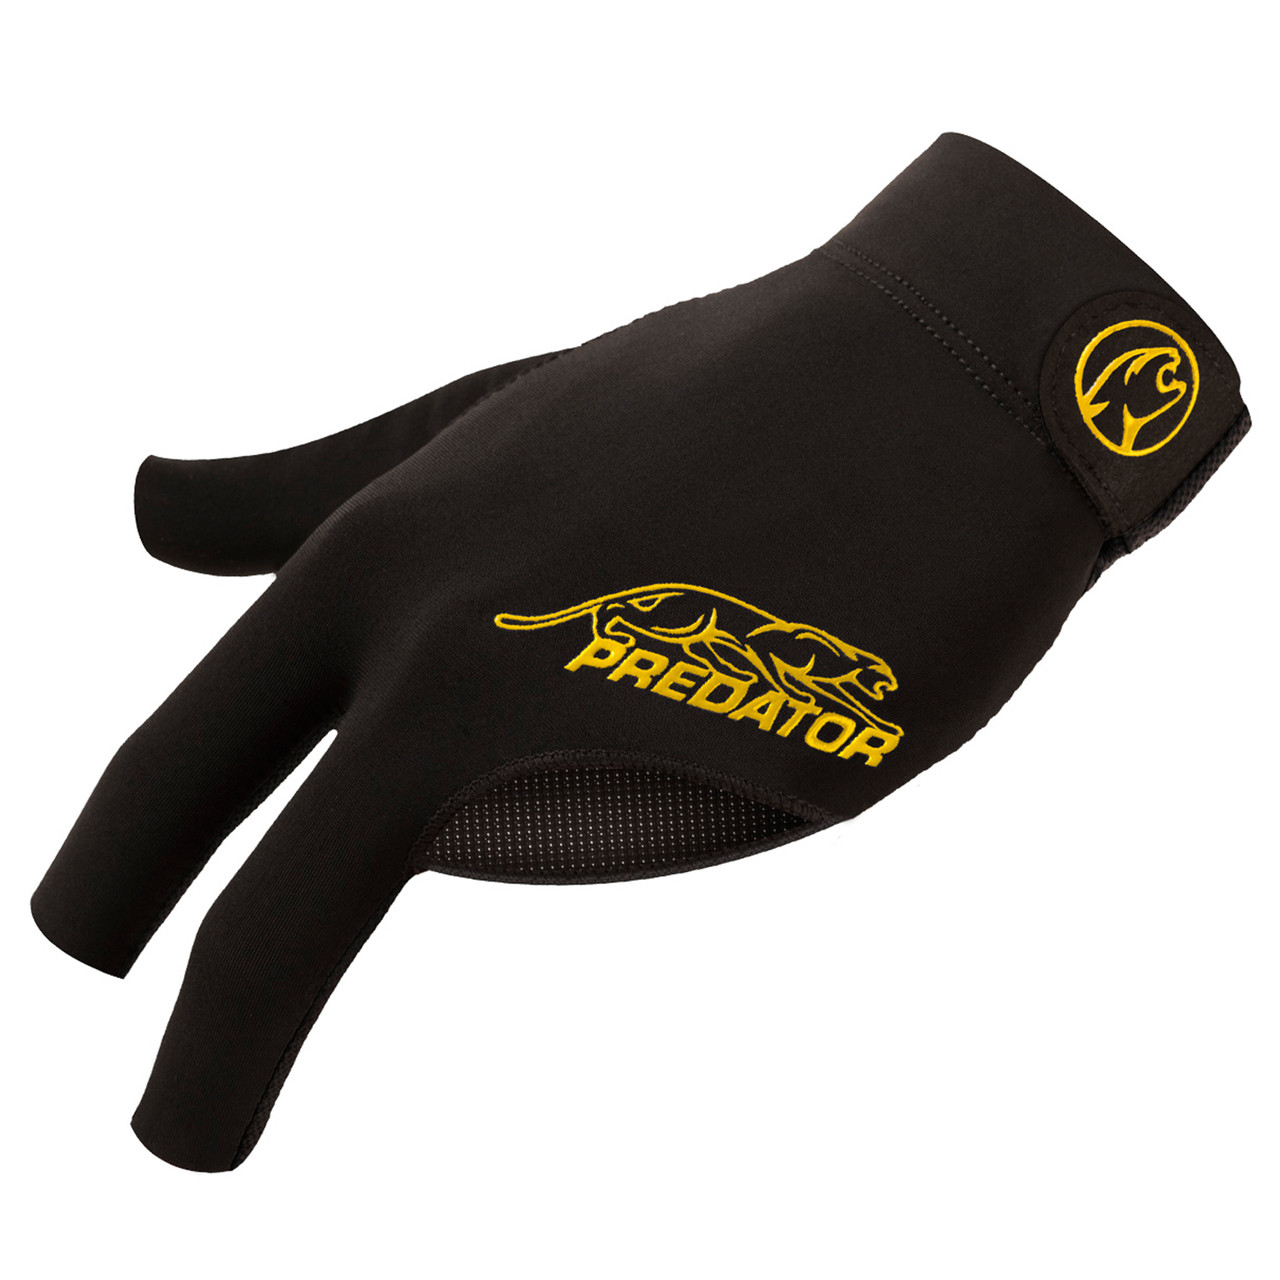 Predator Second Skin Pool Glove - Glove Only